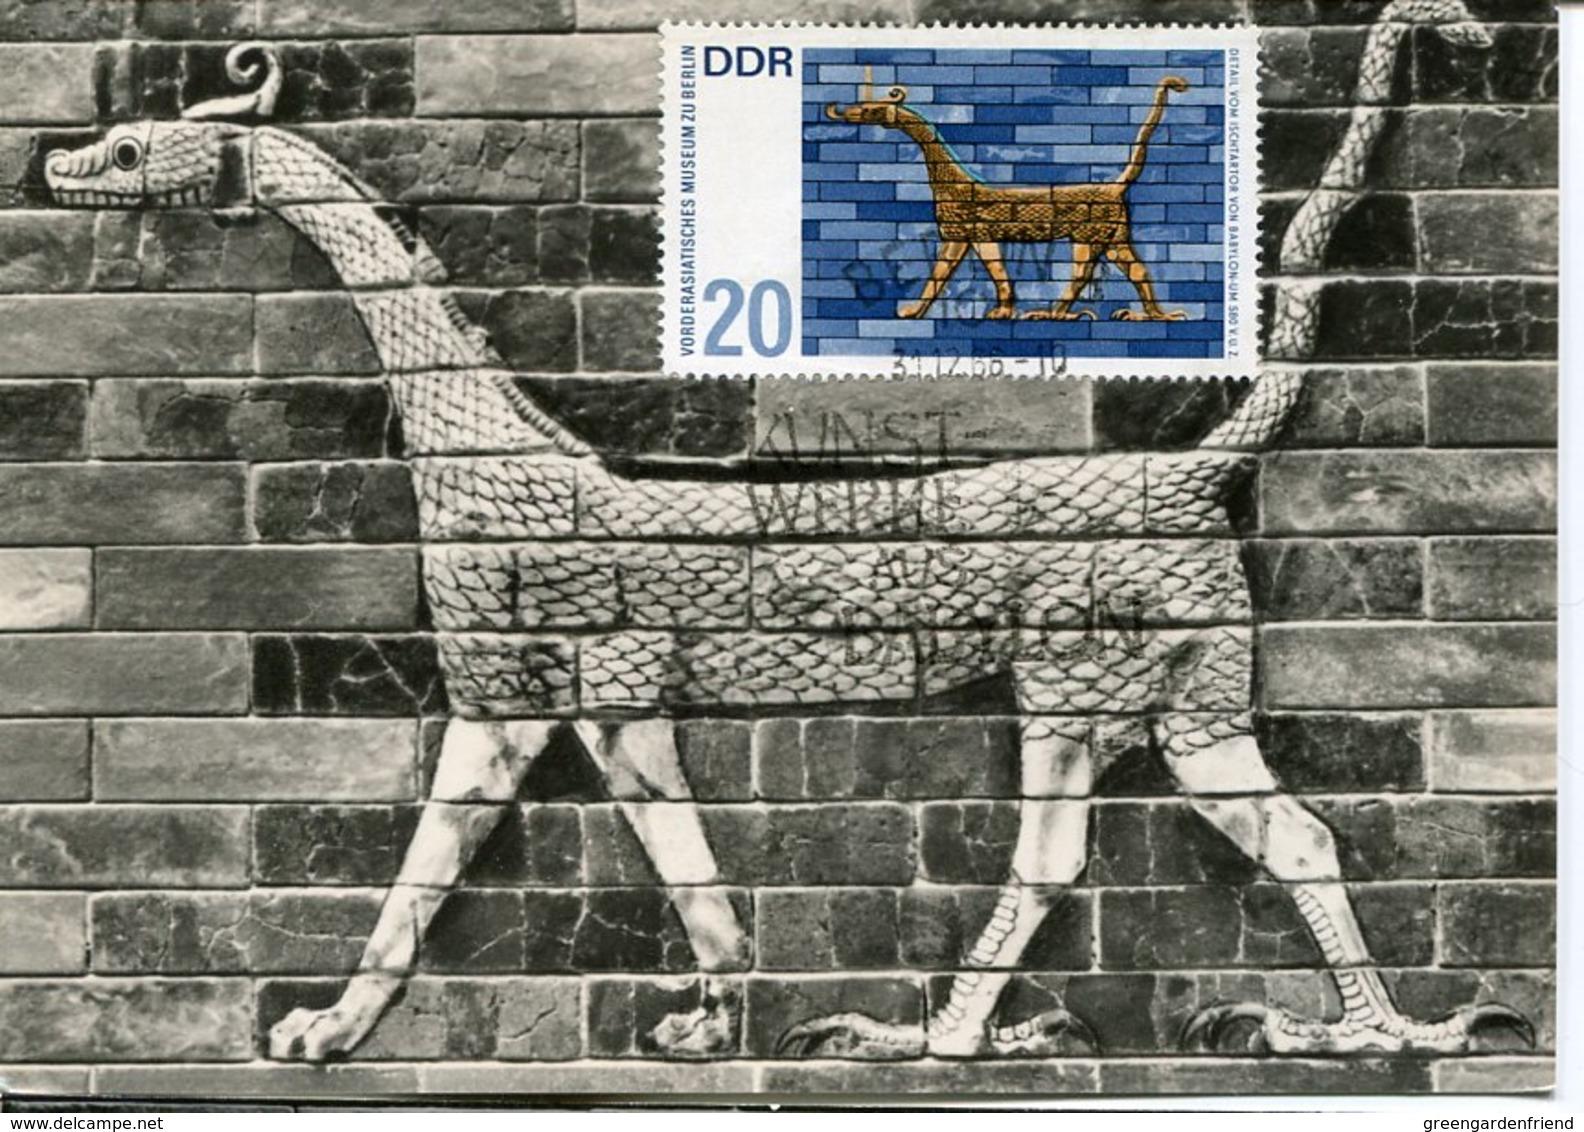 45670 Germany Ddr, Maximum 1966 Mosaic Exhibition Of The Throne Of Babylon, Mi-1230 - [6] Repubblica Democratica